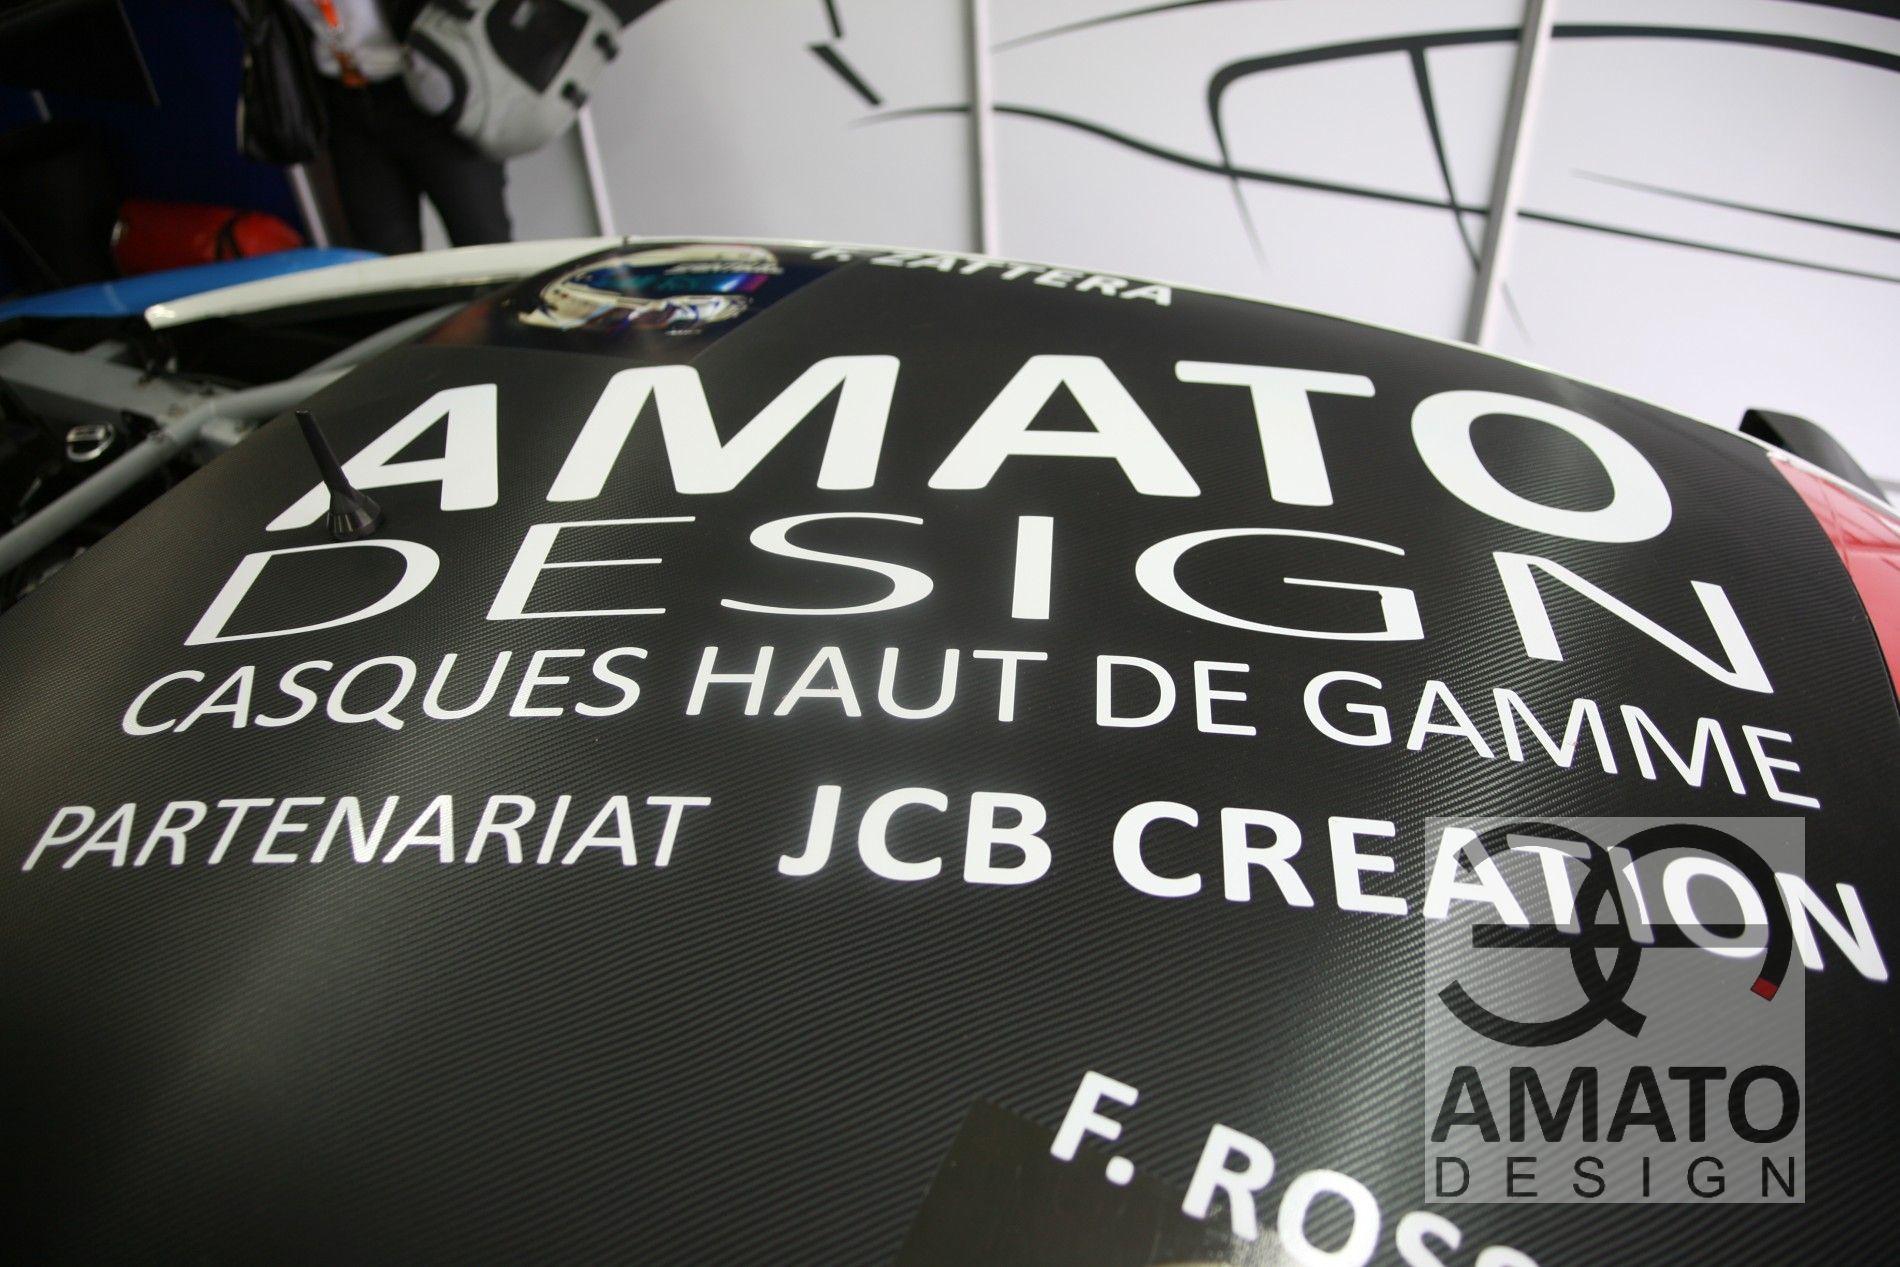 Amato Design - GT TOUR 2013